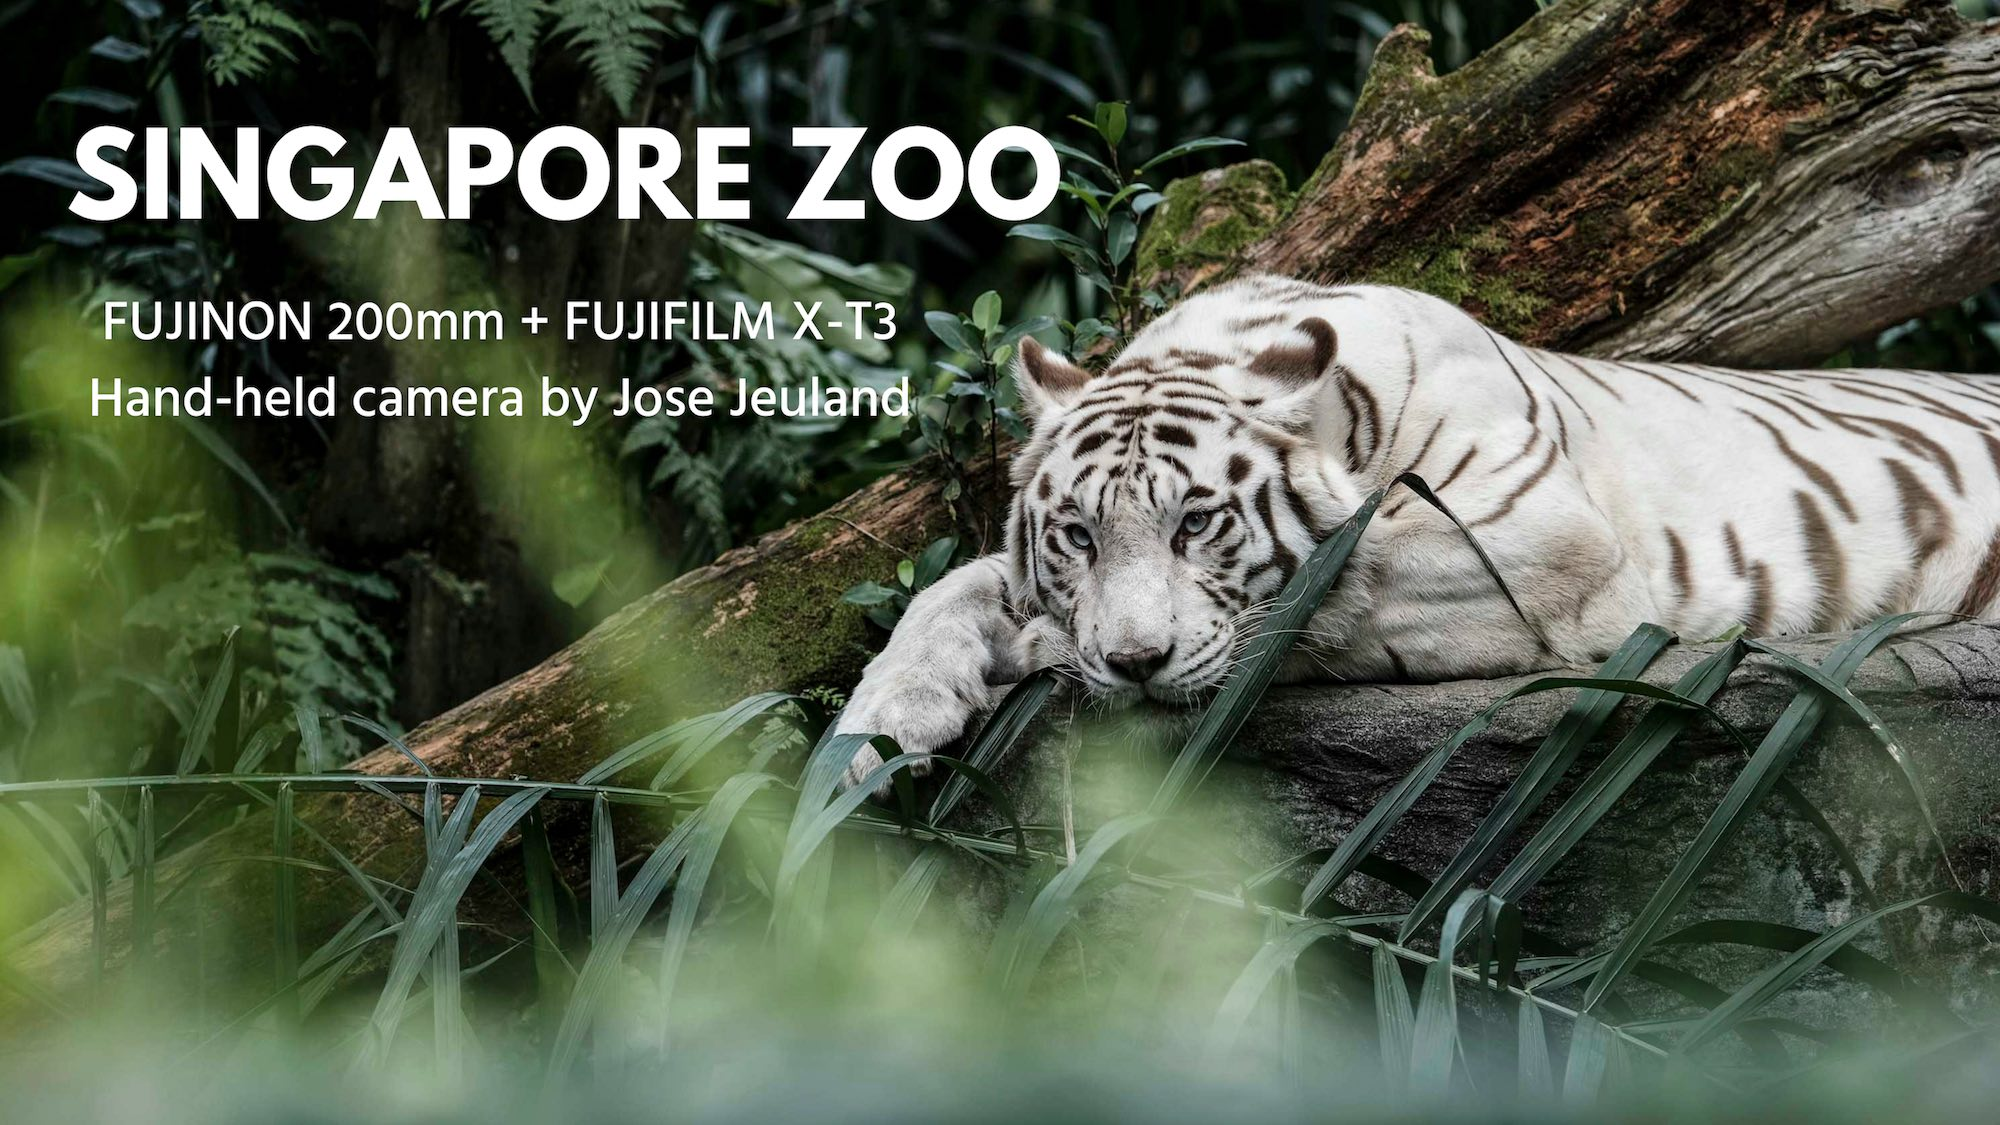 Singapore zoo animals fujinon 200mm f2 fujifilm XT3 tiger white